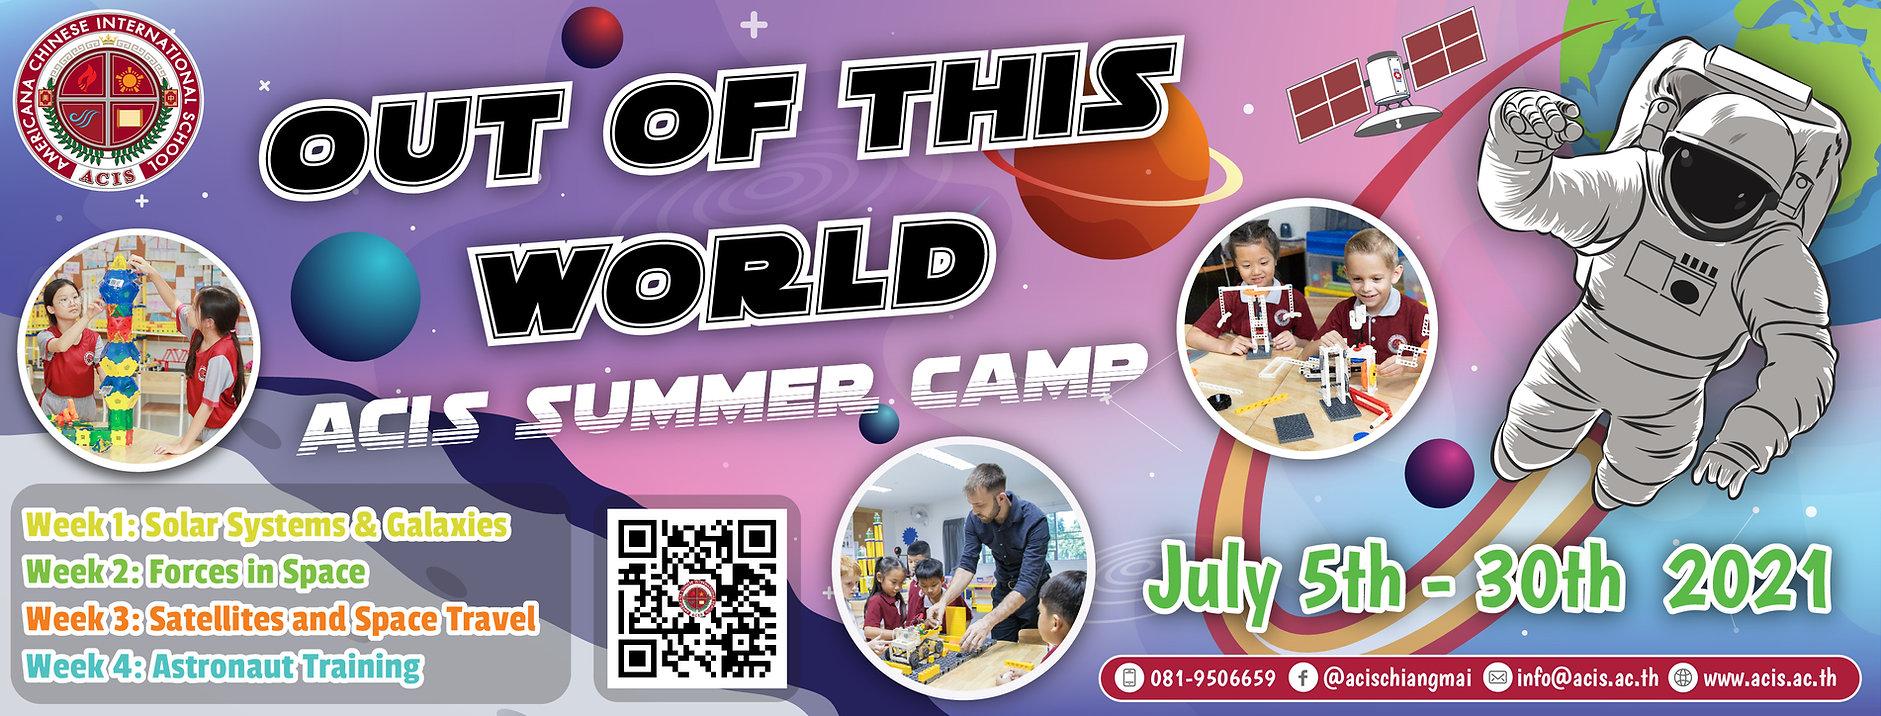 Cover Summer 2021 edit1-01.jpg